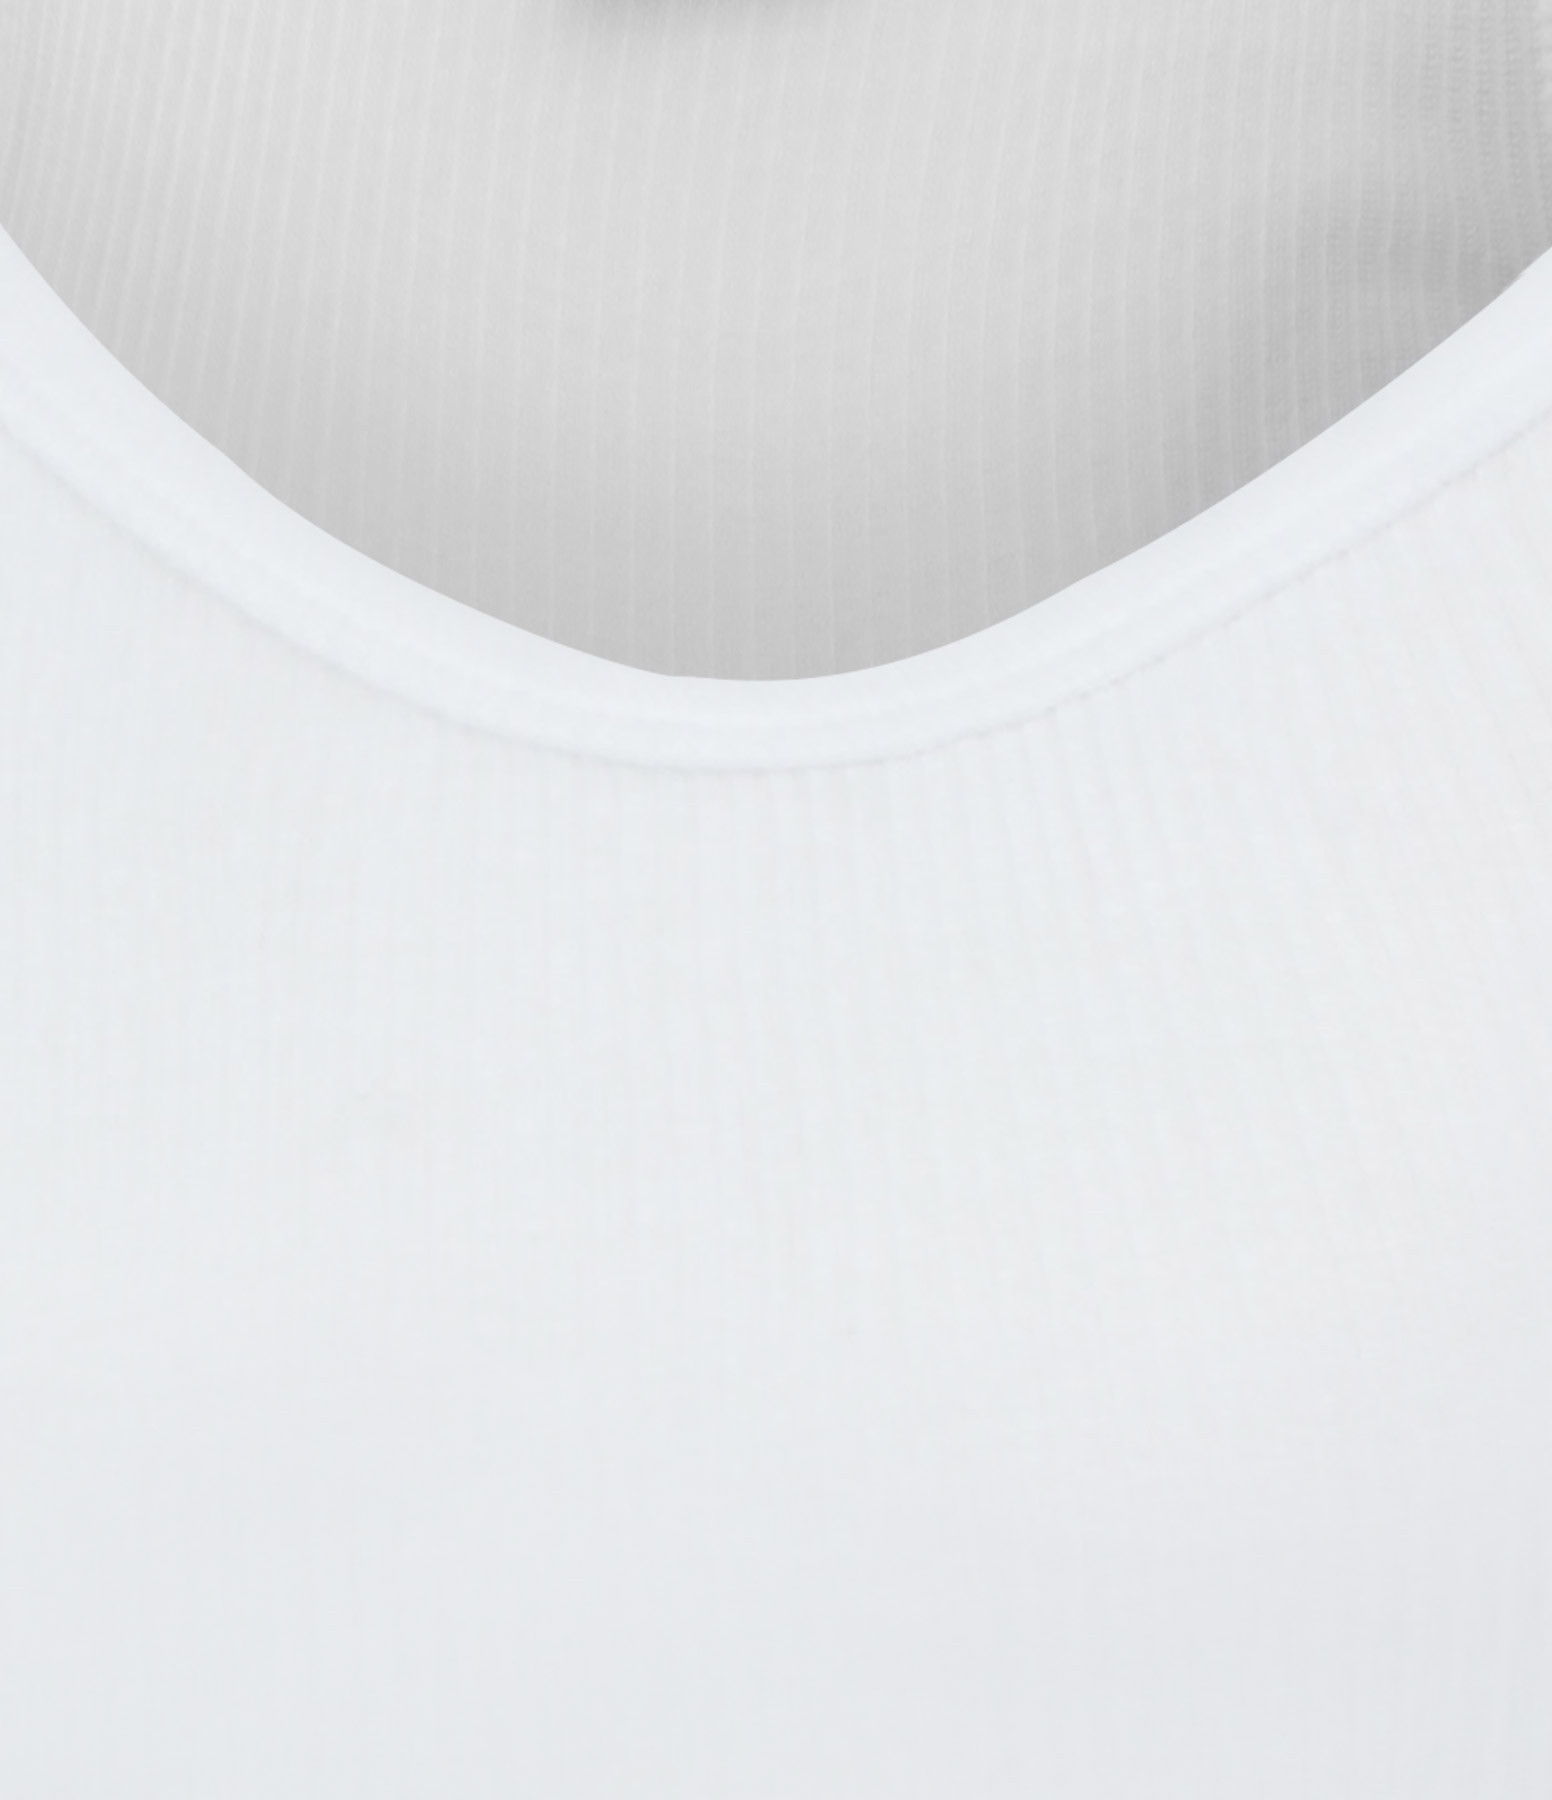 ISABEL MARANT ÉTOILE - Top Louisaneac Coton Blanc